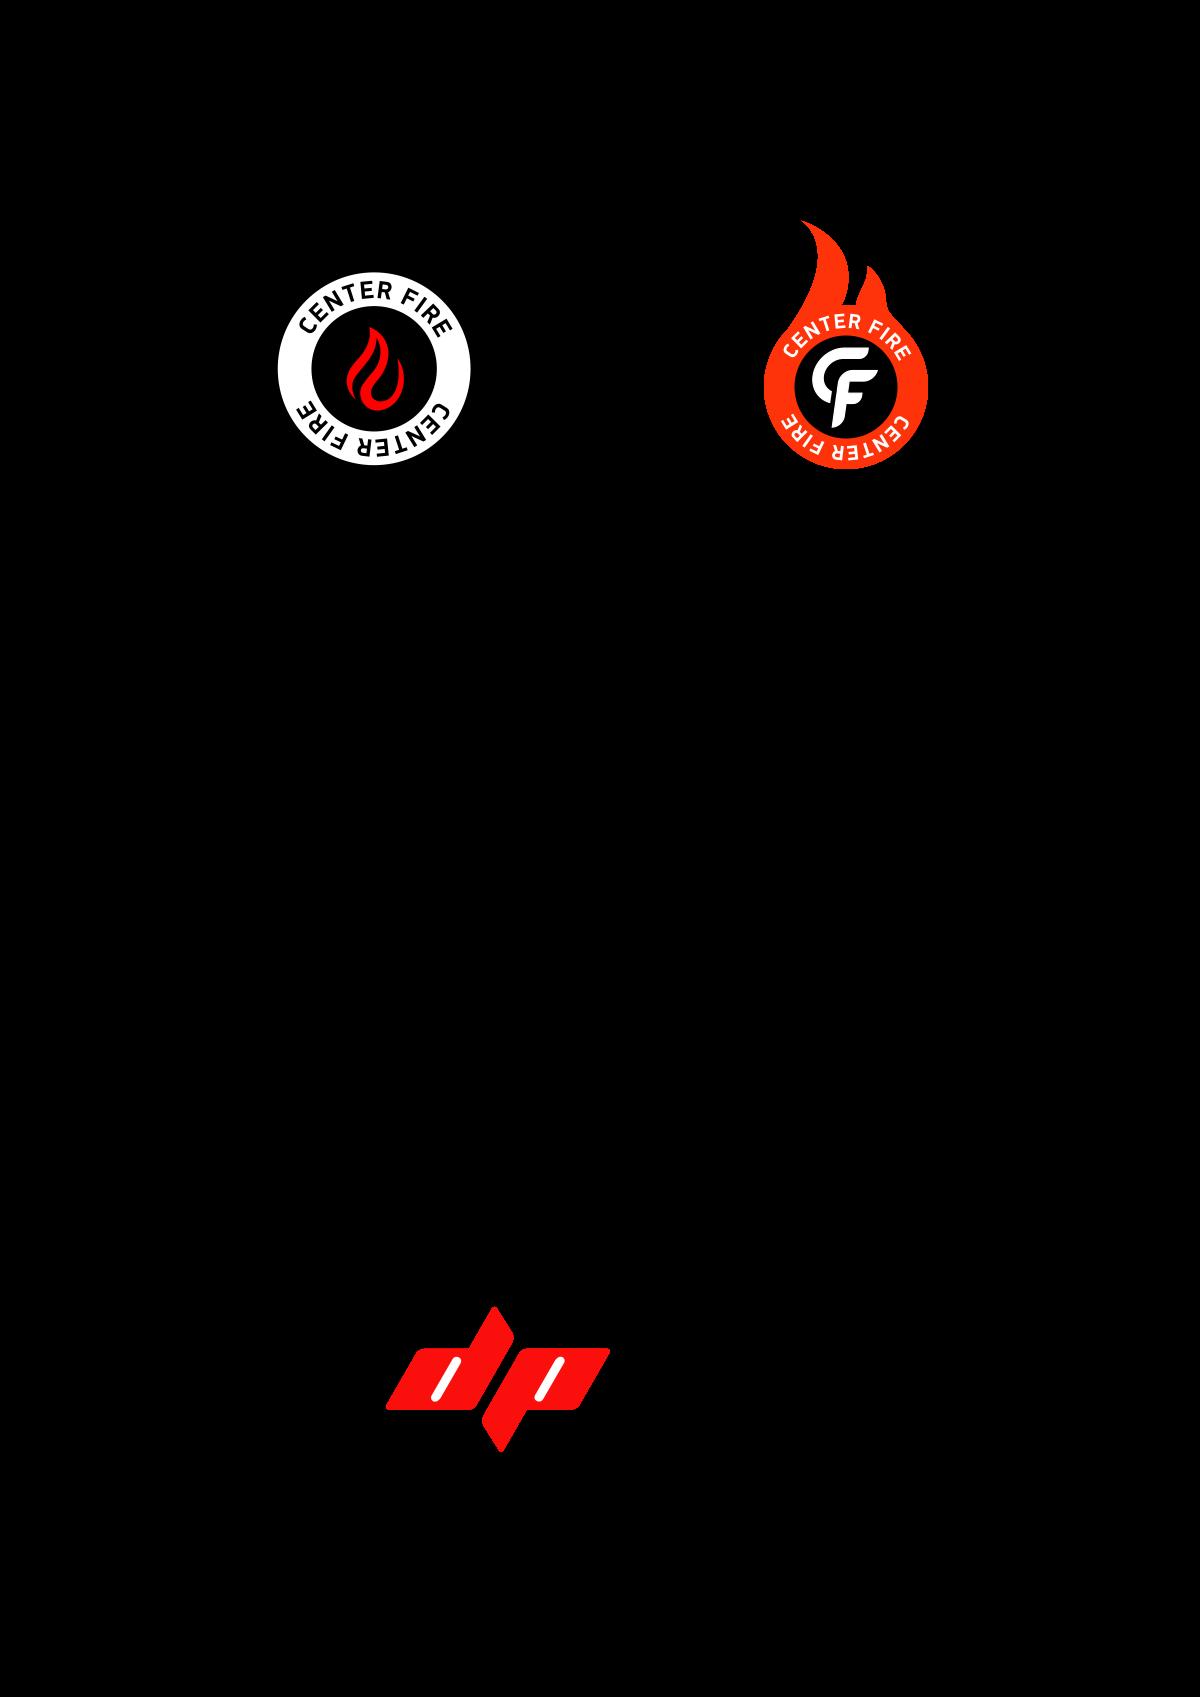 Center fire logo, enhance DP logo